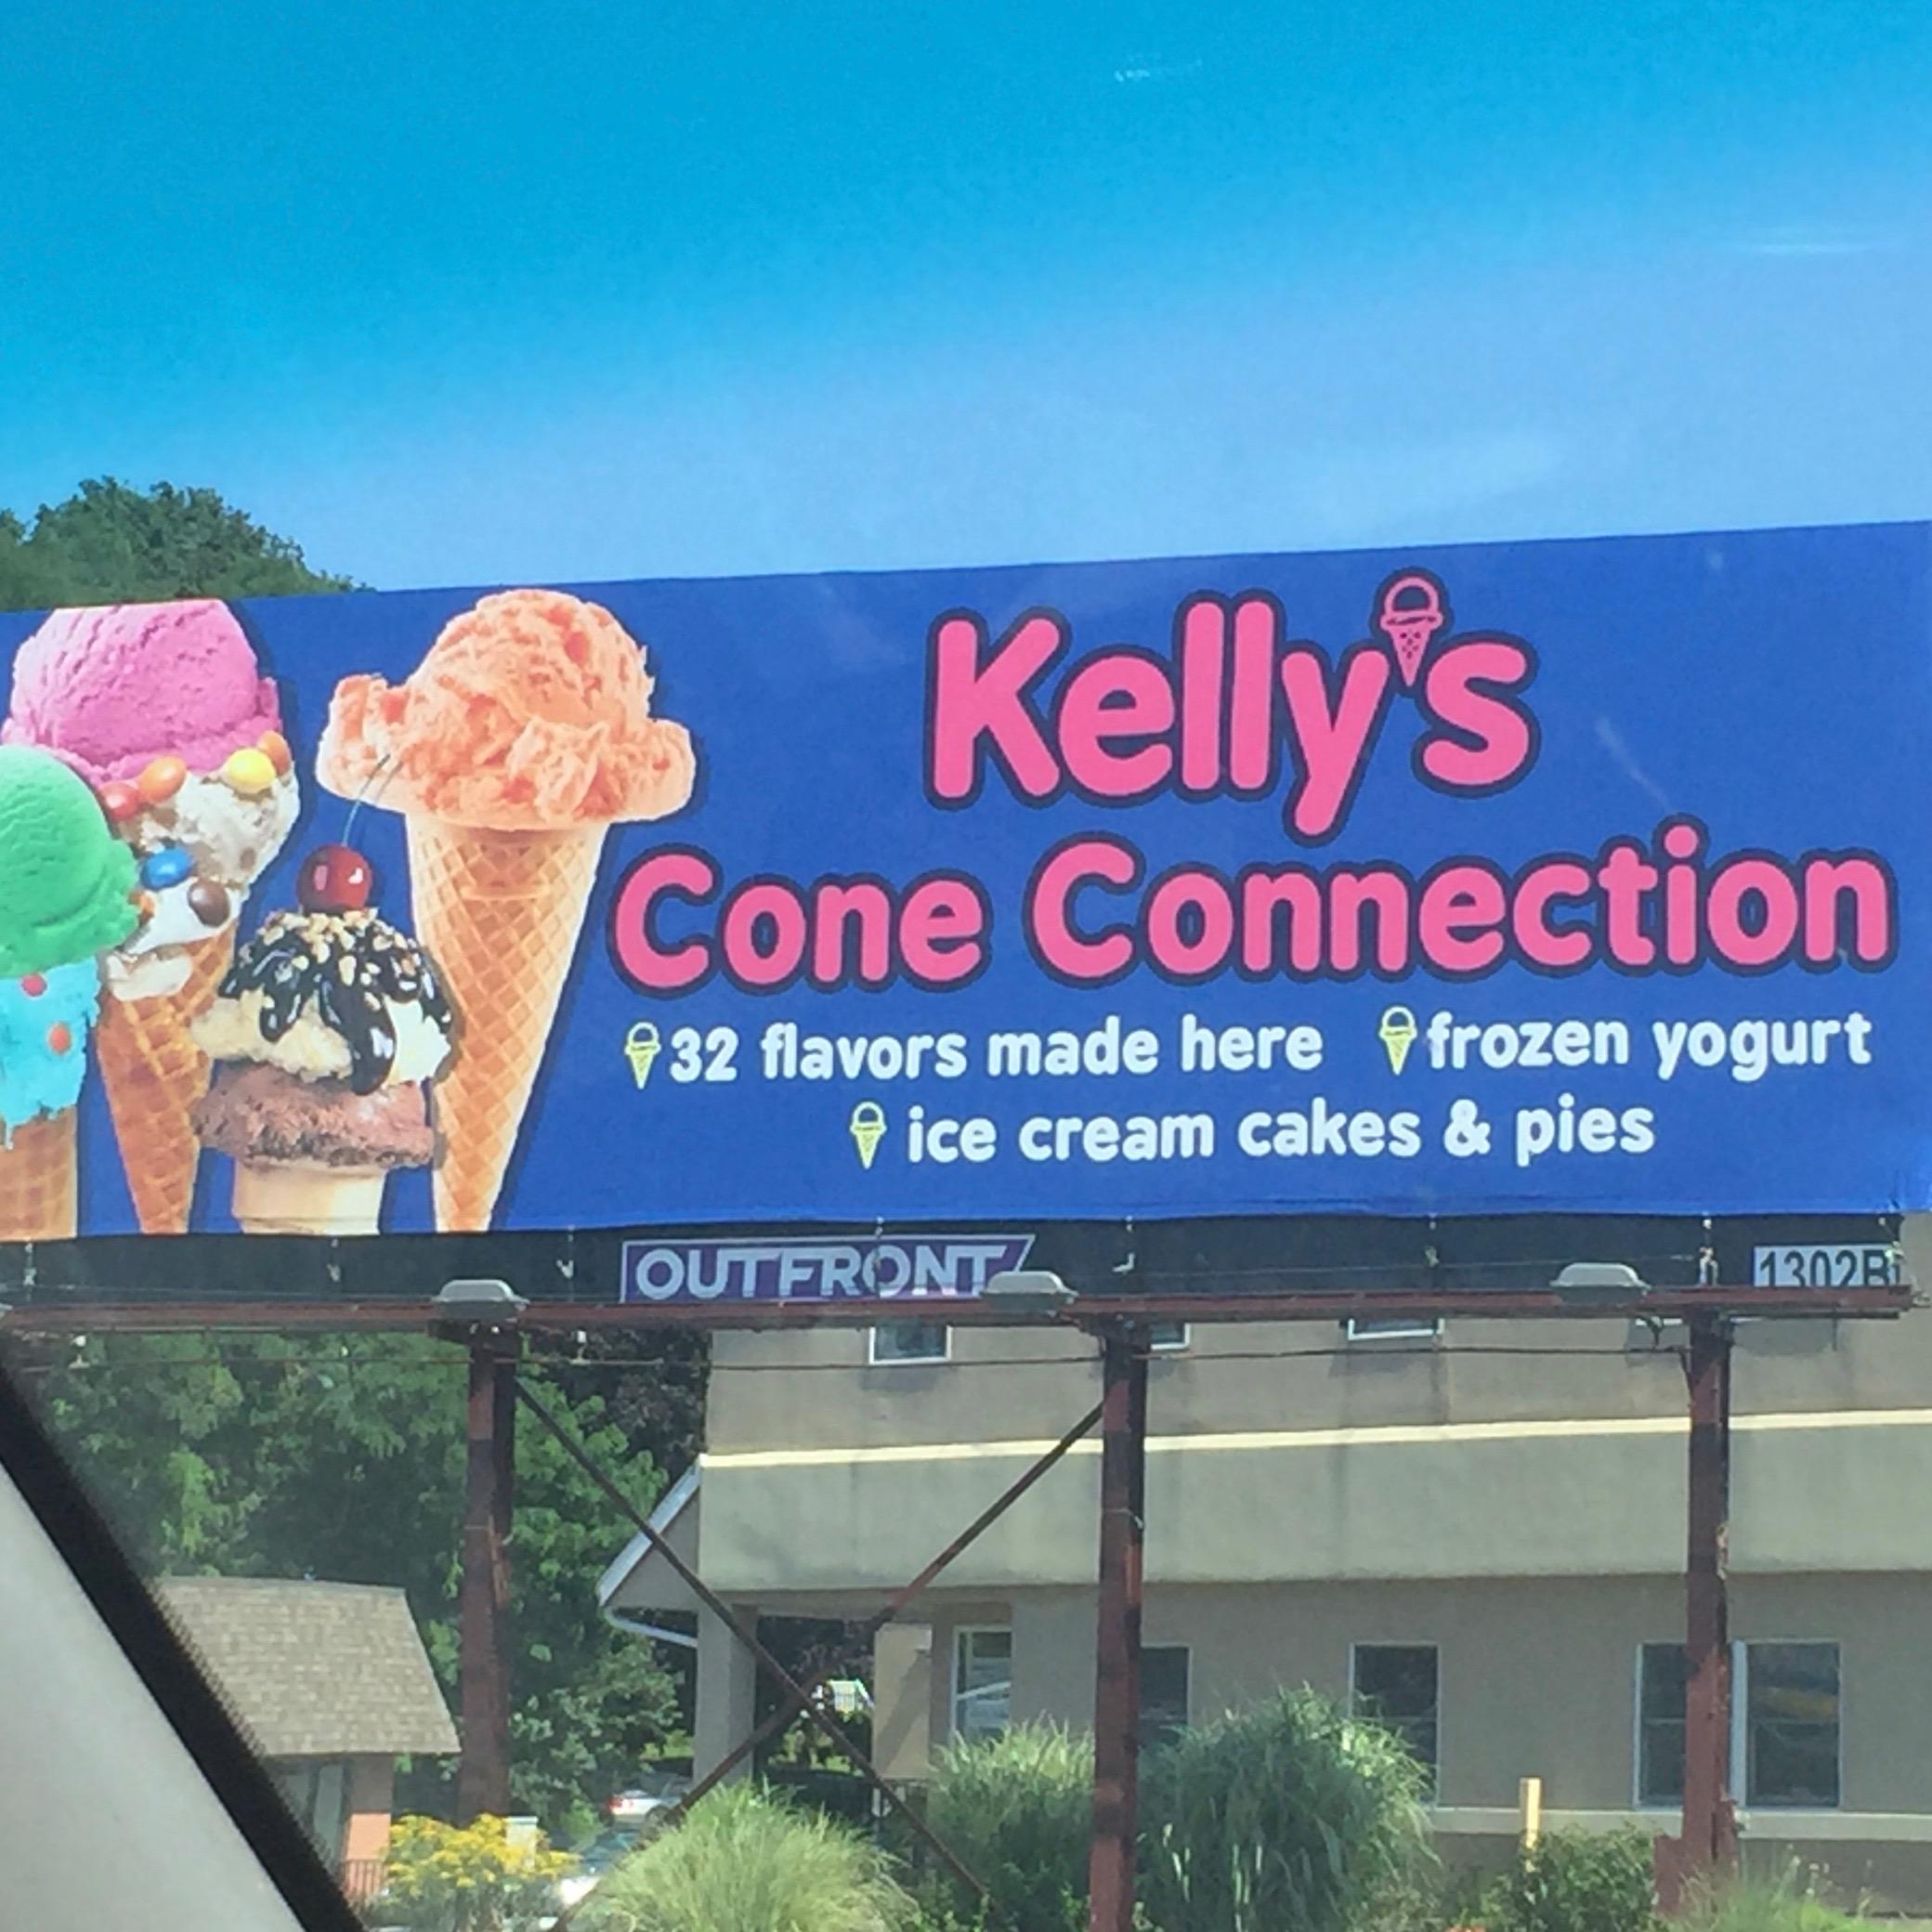 kelly's sign.jpg